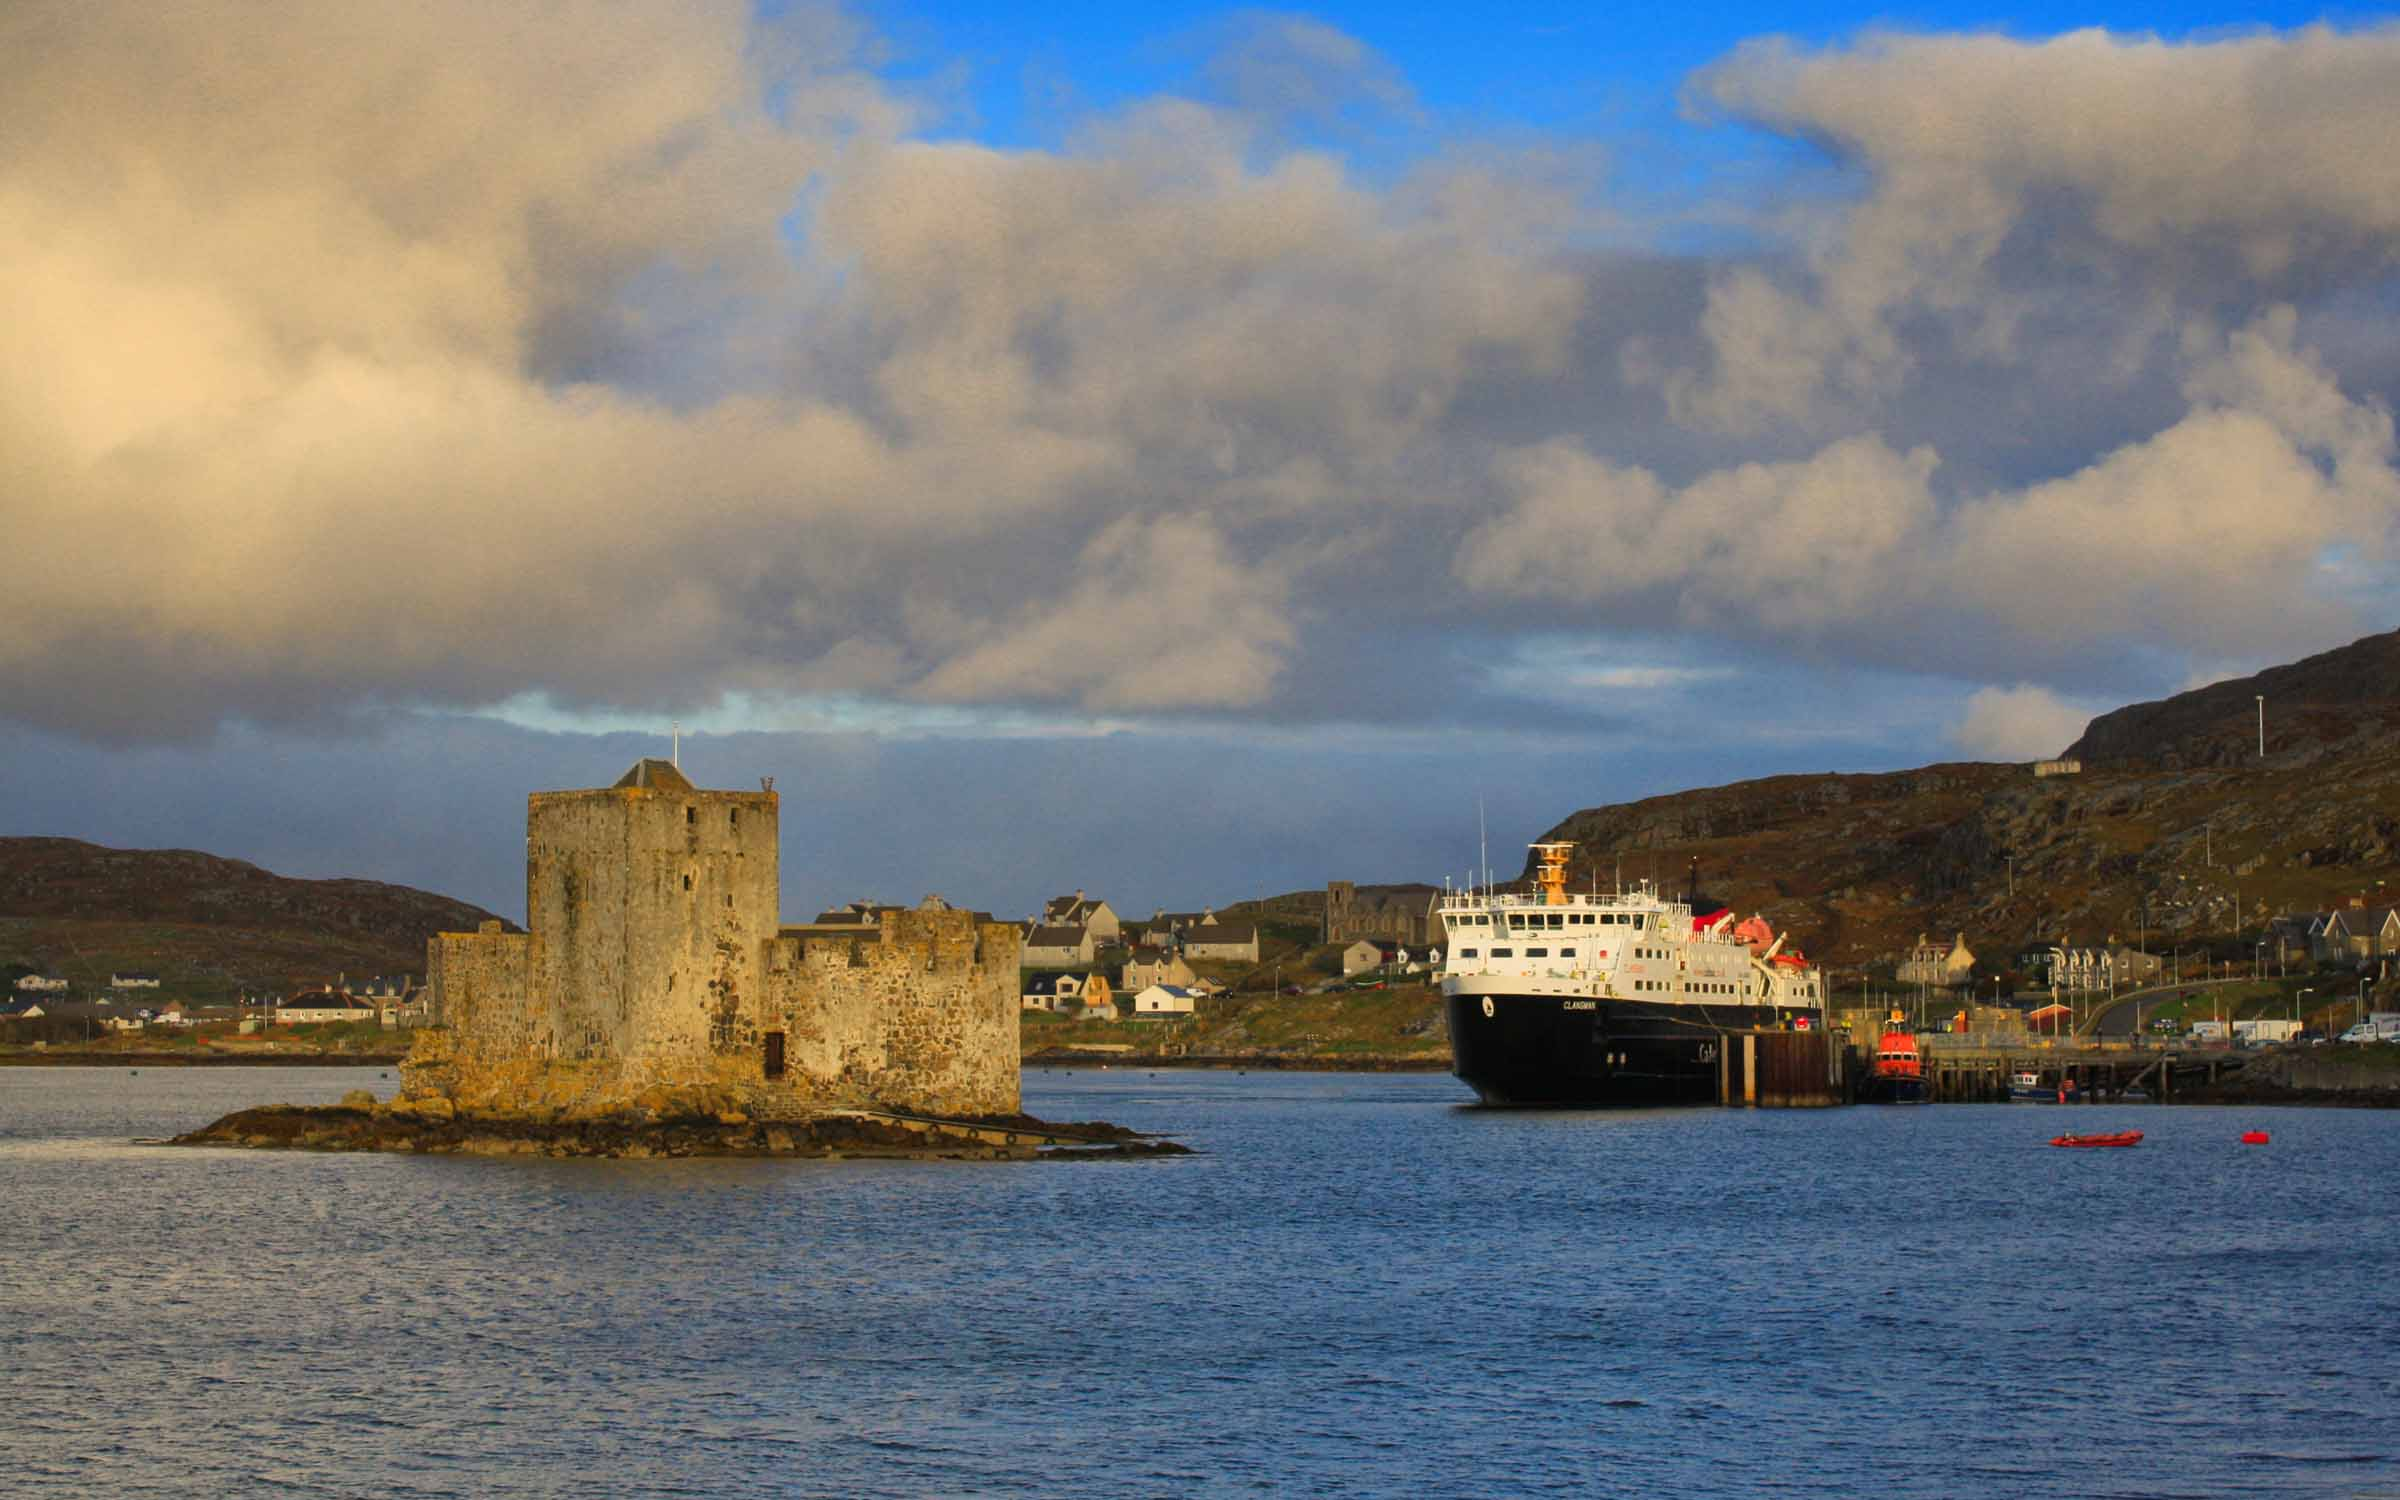 Clansman alongside at Castlebay (Ships of CalMac)